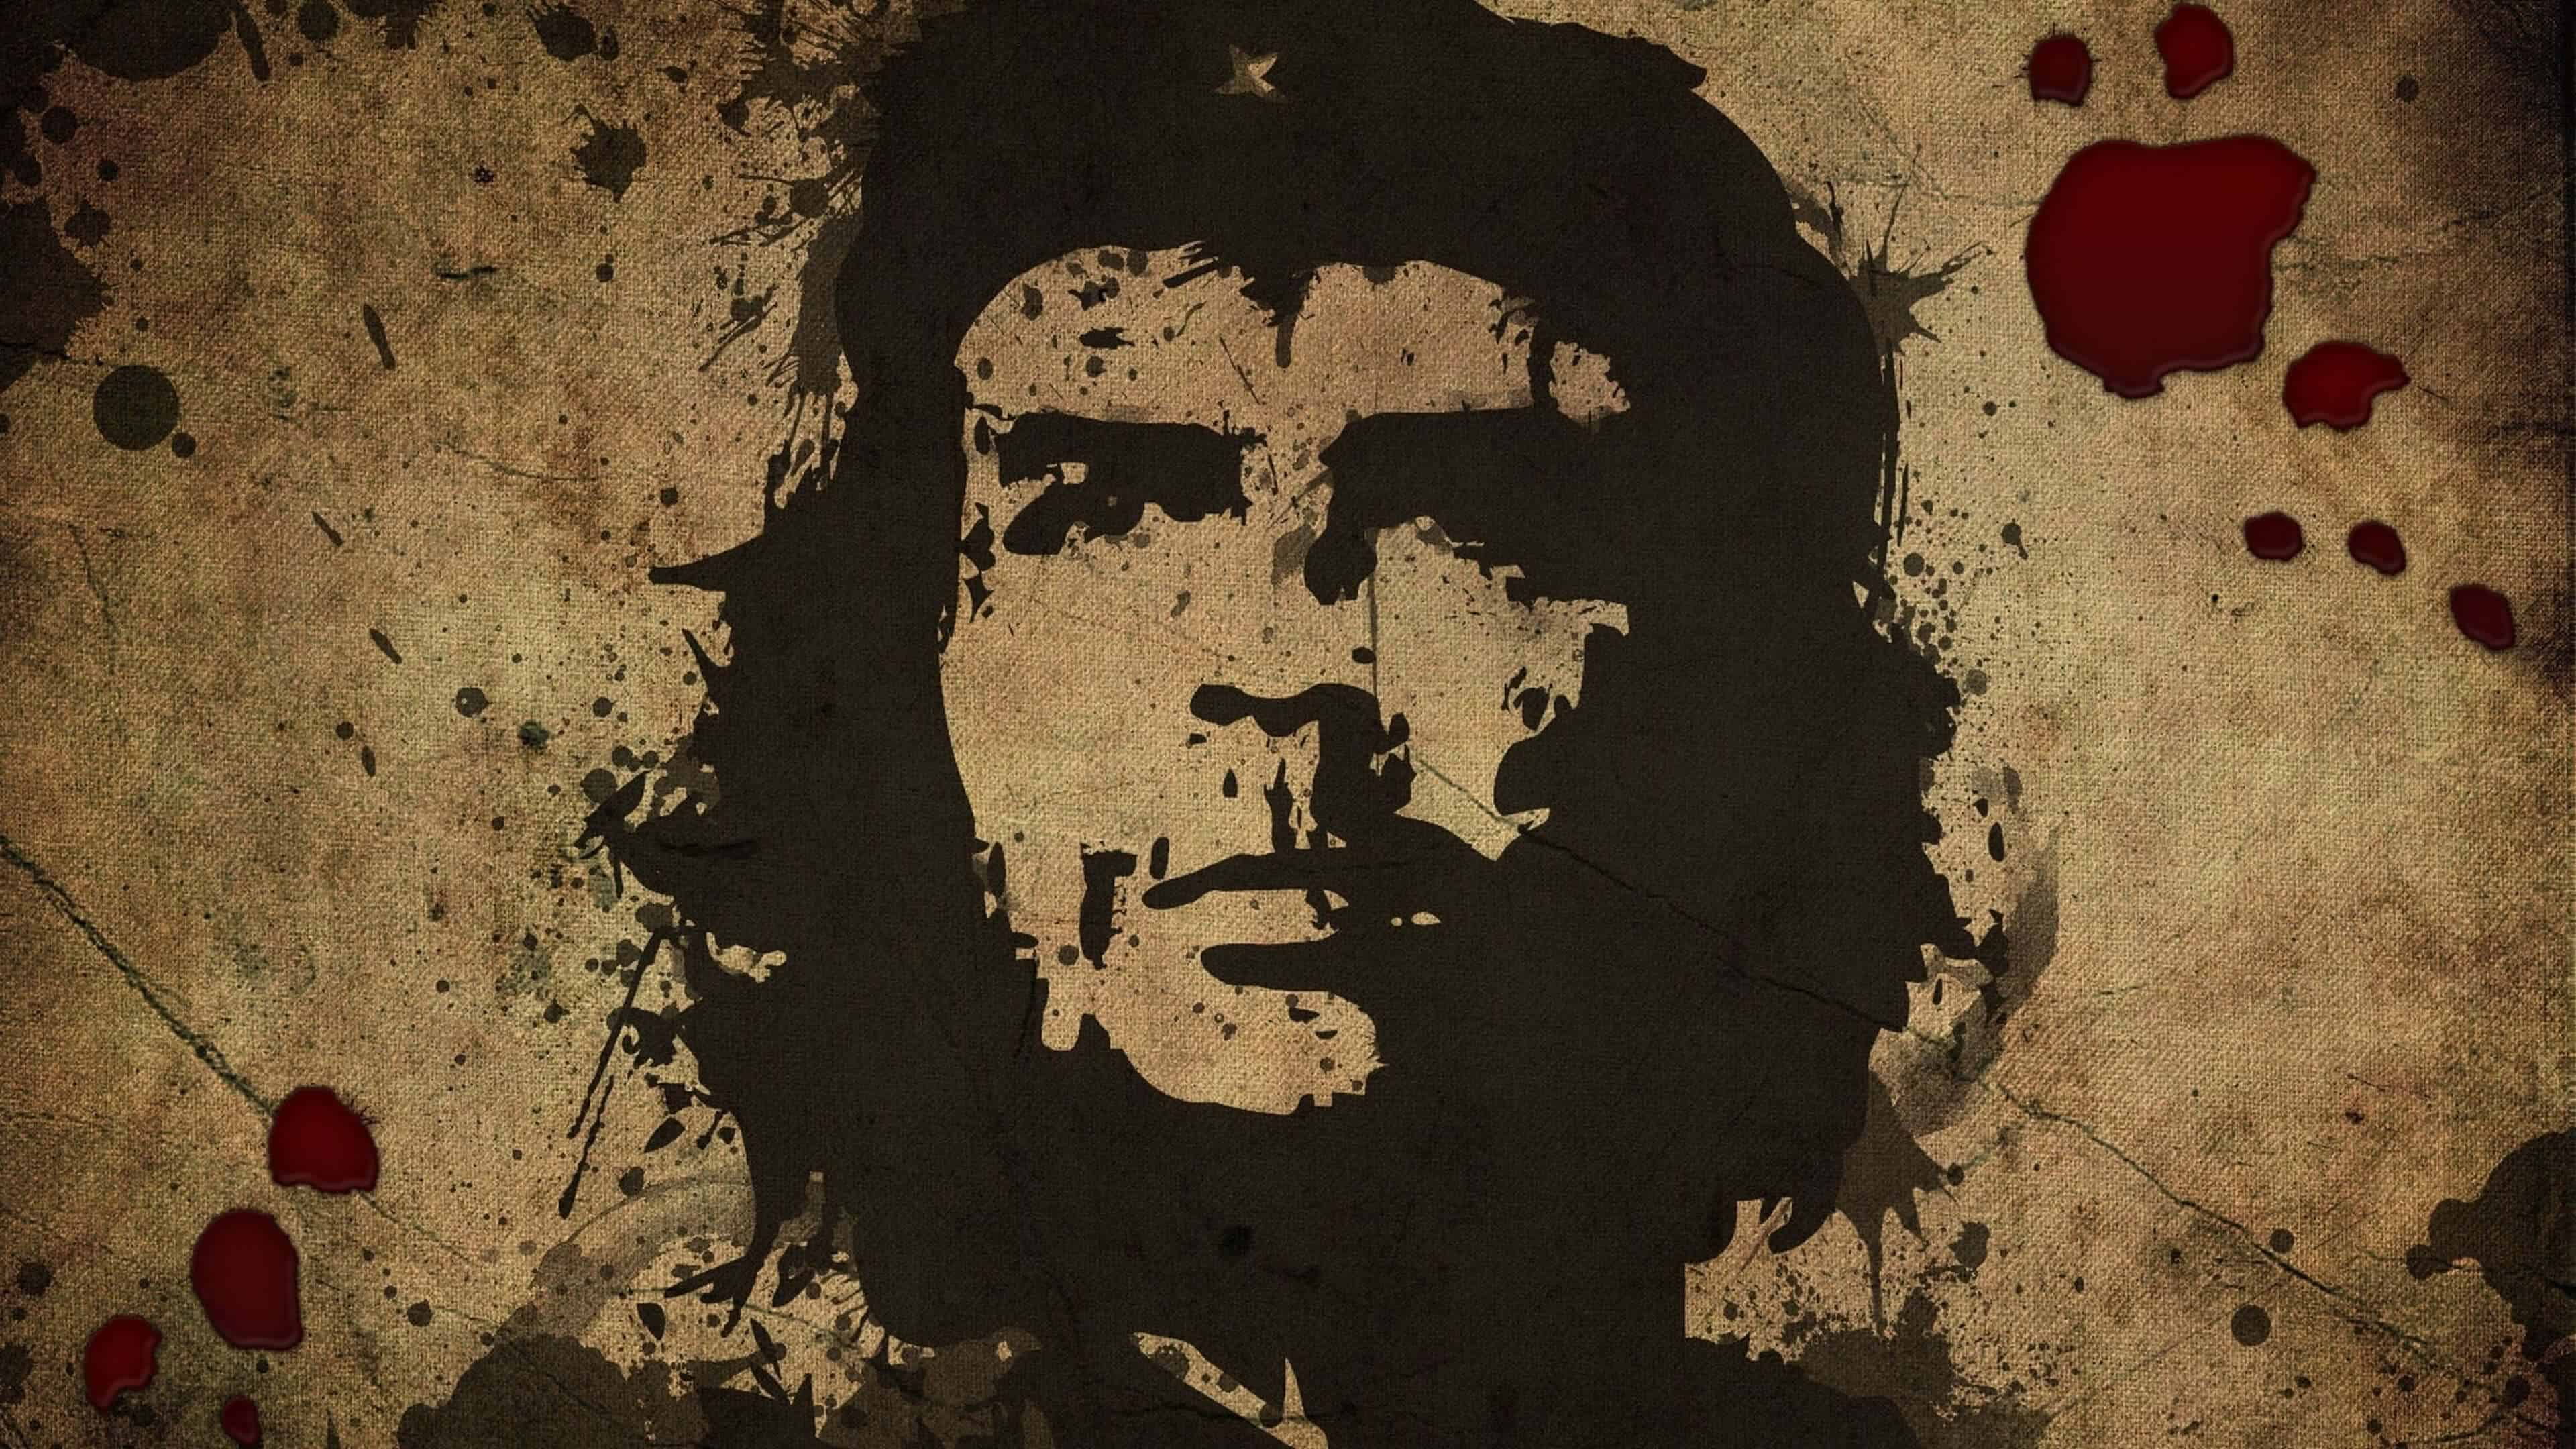 Che Guevara Uhd 4k Wallpaper Pixelz